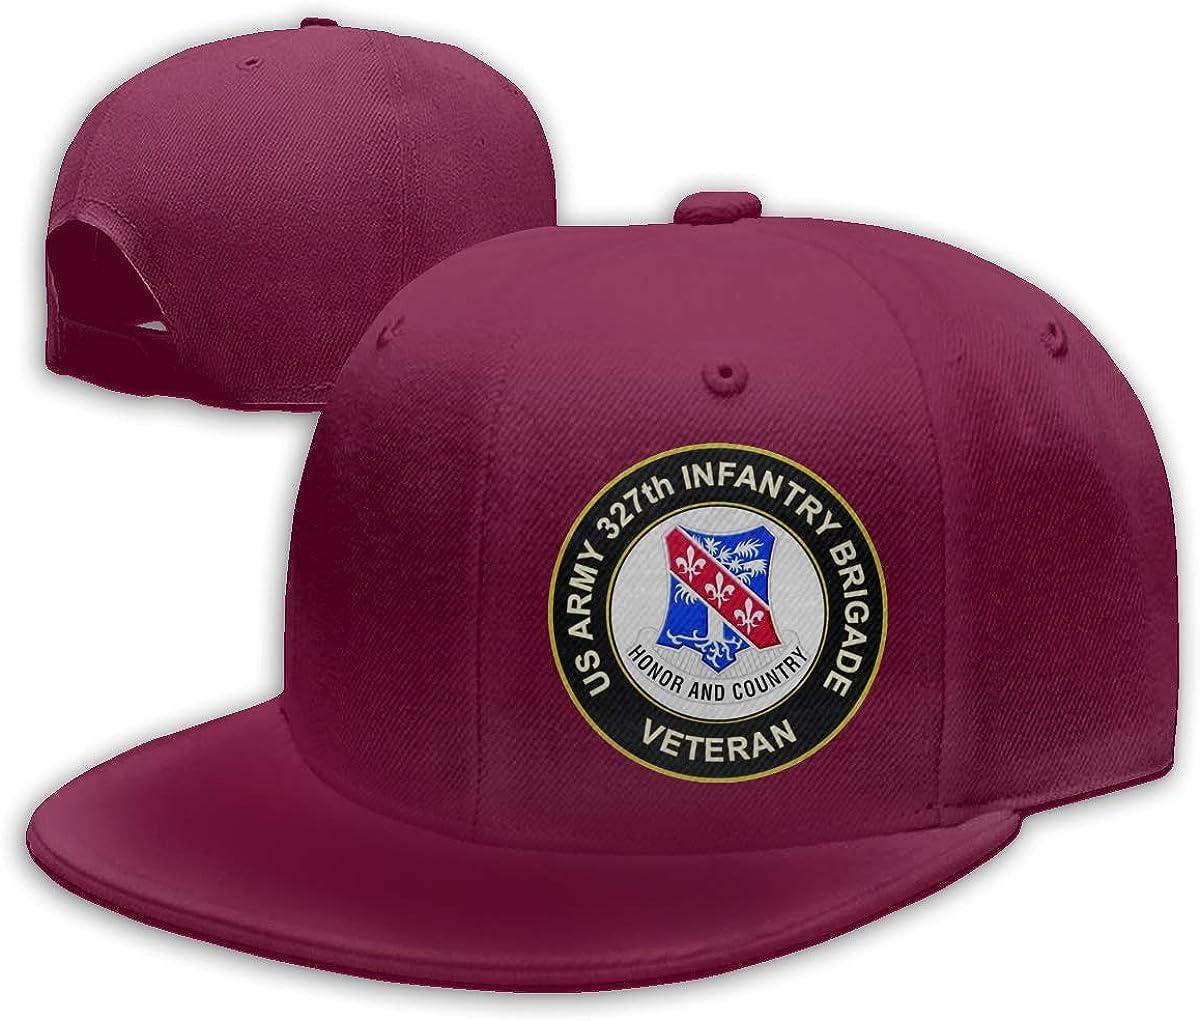 US Army Veteran 327th Infantry Brigade Adjustable Snapback Hats Unisex Cotton Baseball Caps